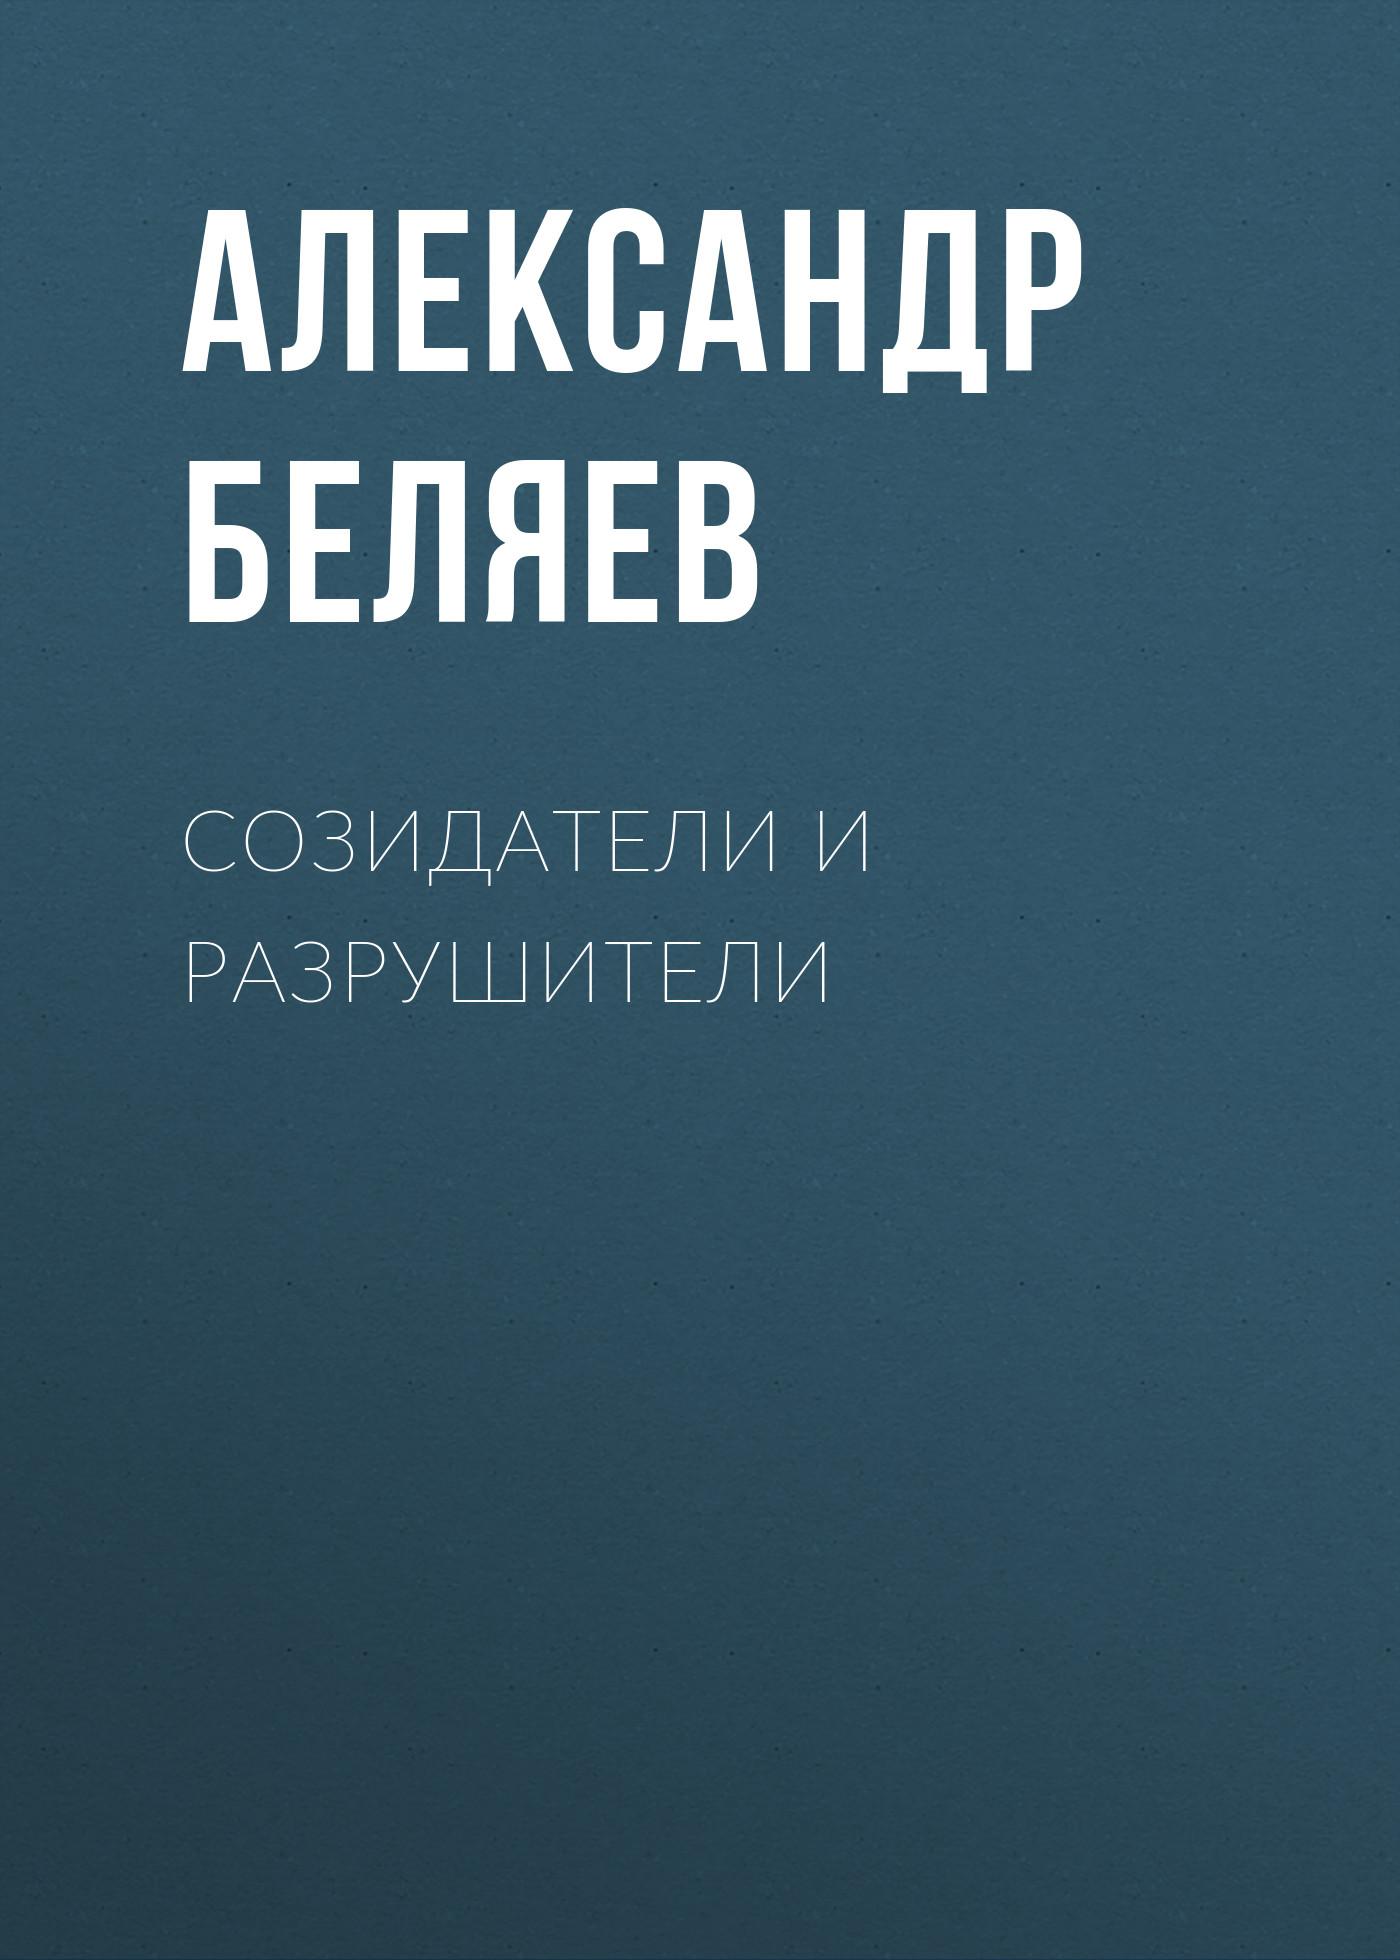 Александр Беляев Созидатели и разрушители александр беляев чёртова мельница